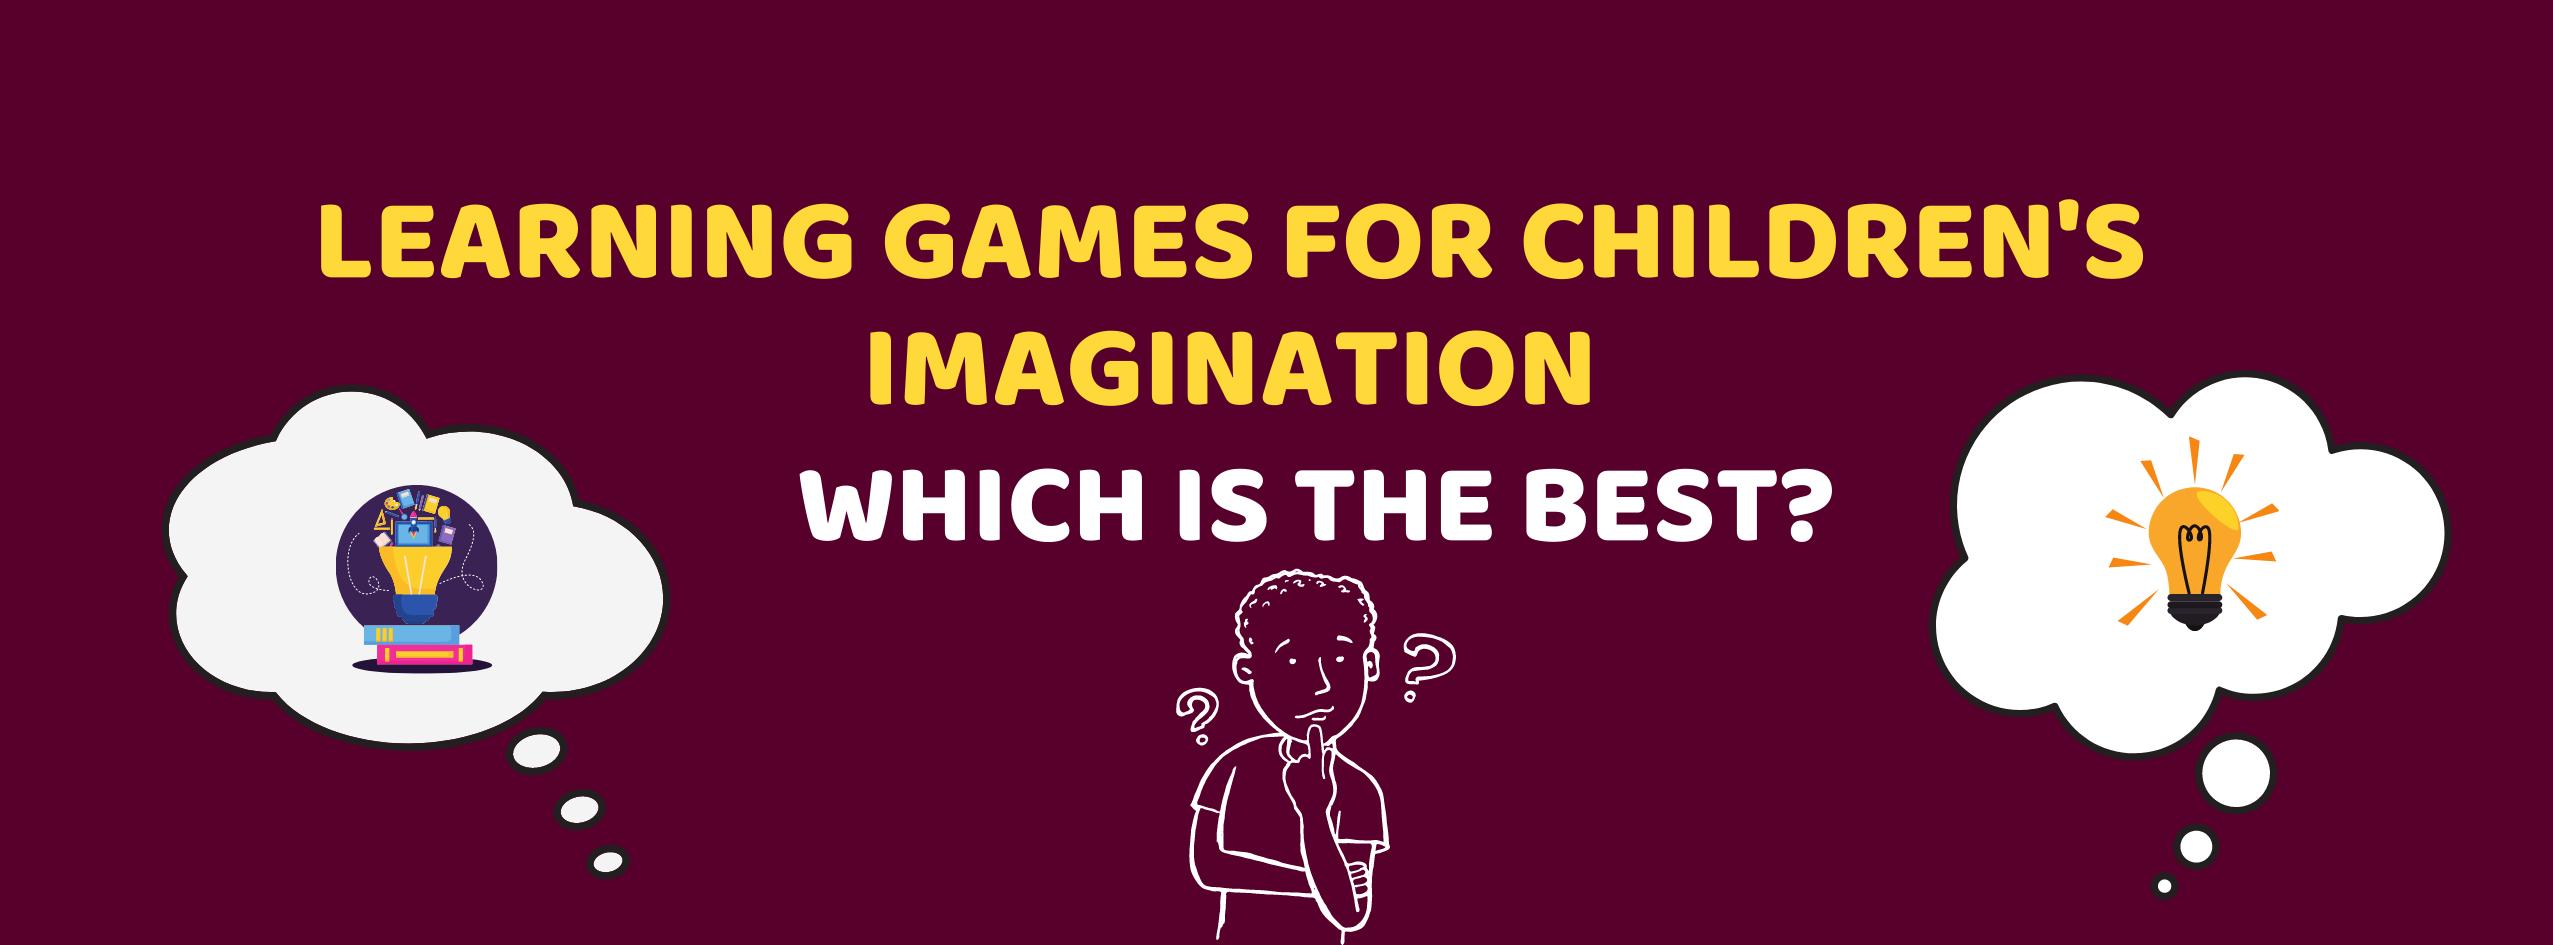 Learning games for children's imagination